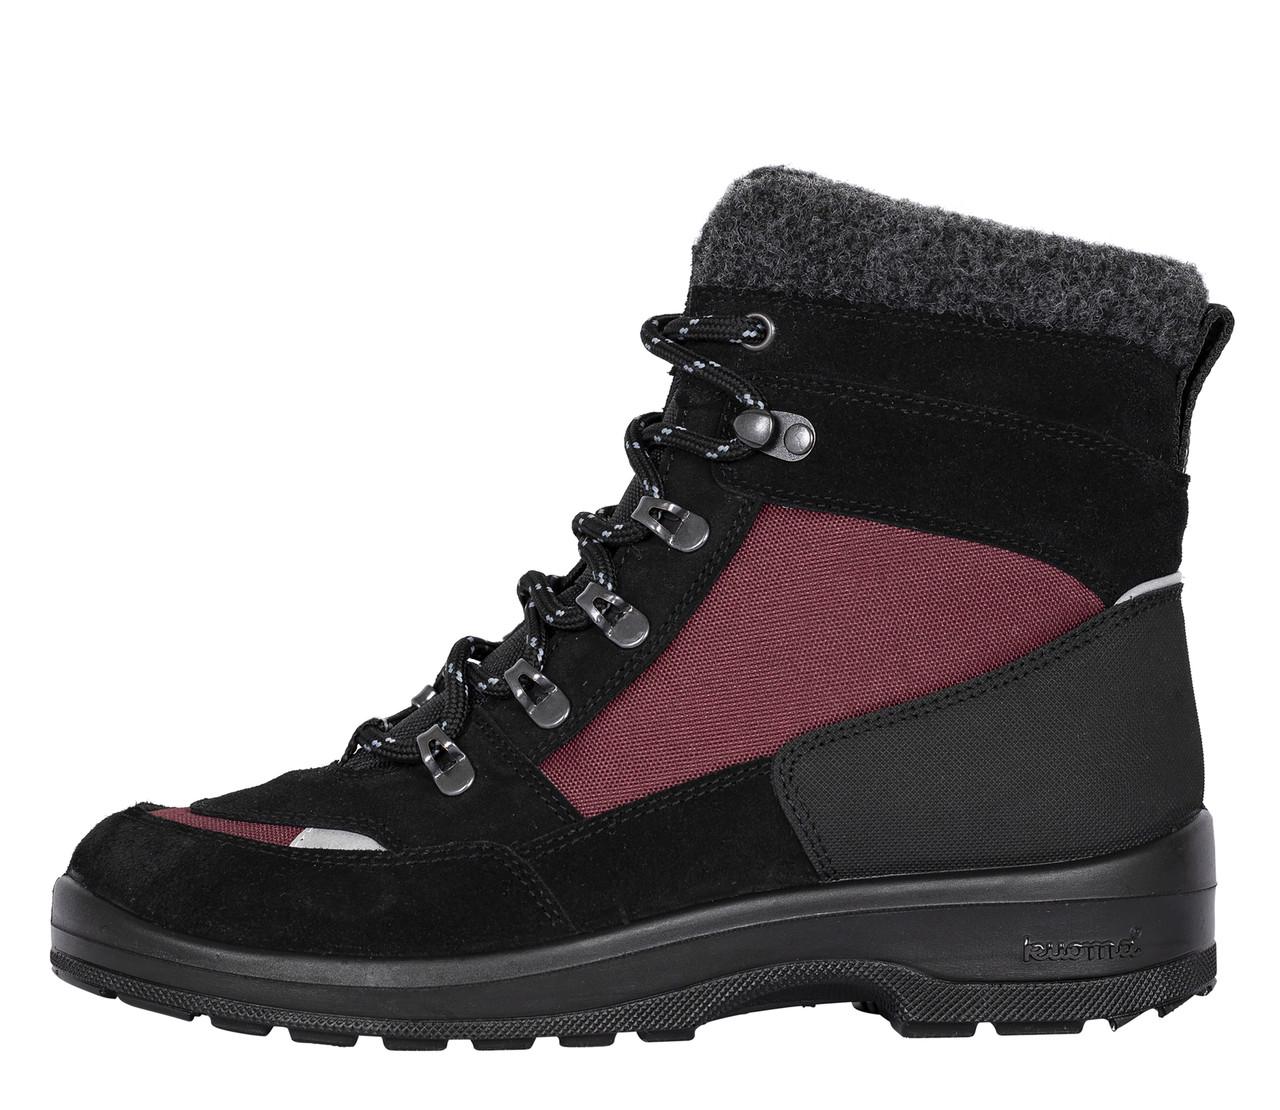 Обувь взрослая Kuoma Tuisku, Bordeaux/Black